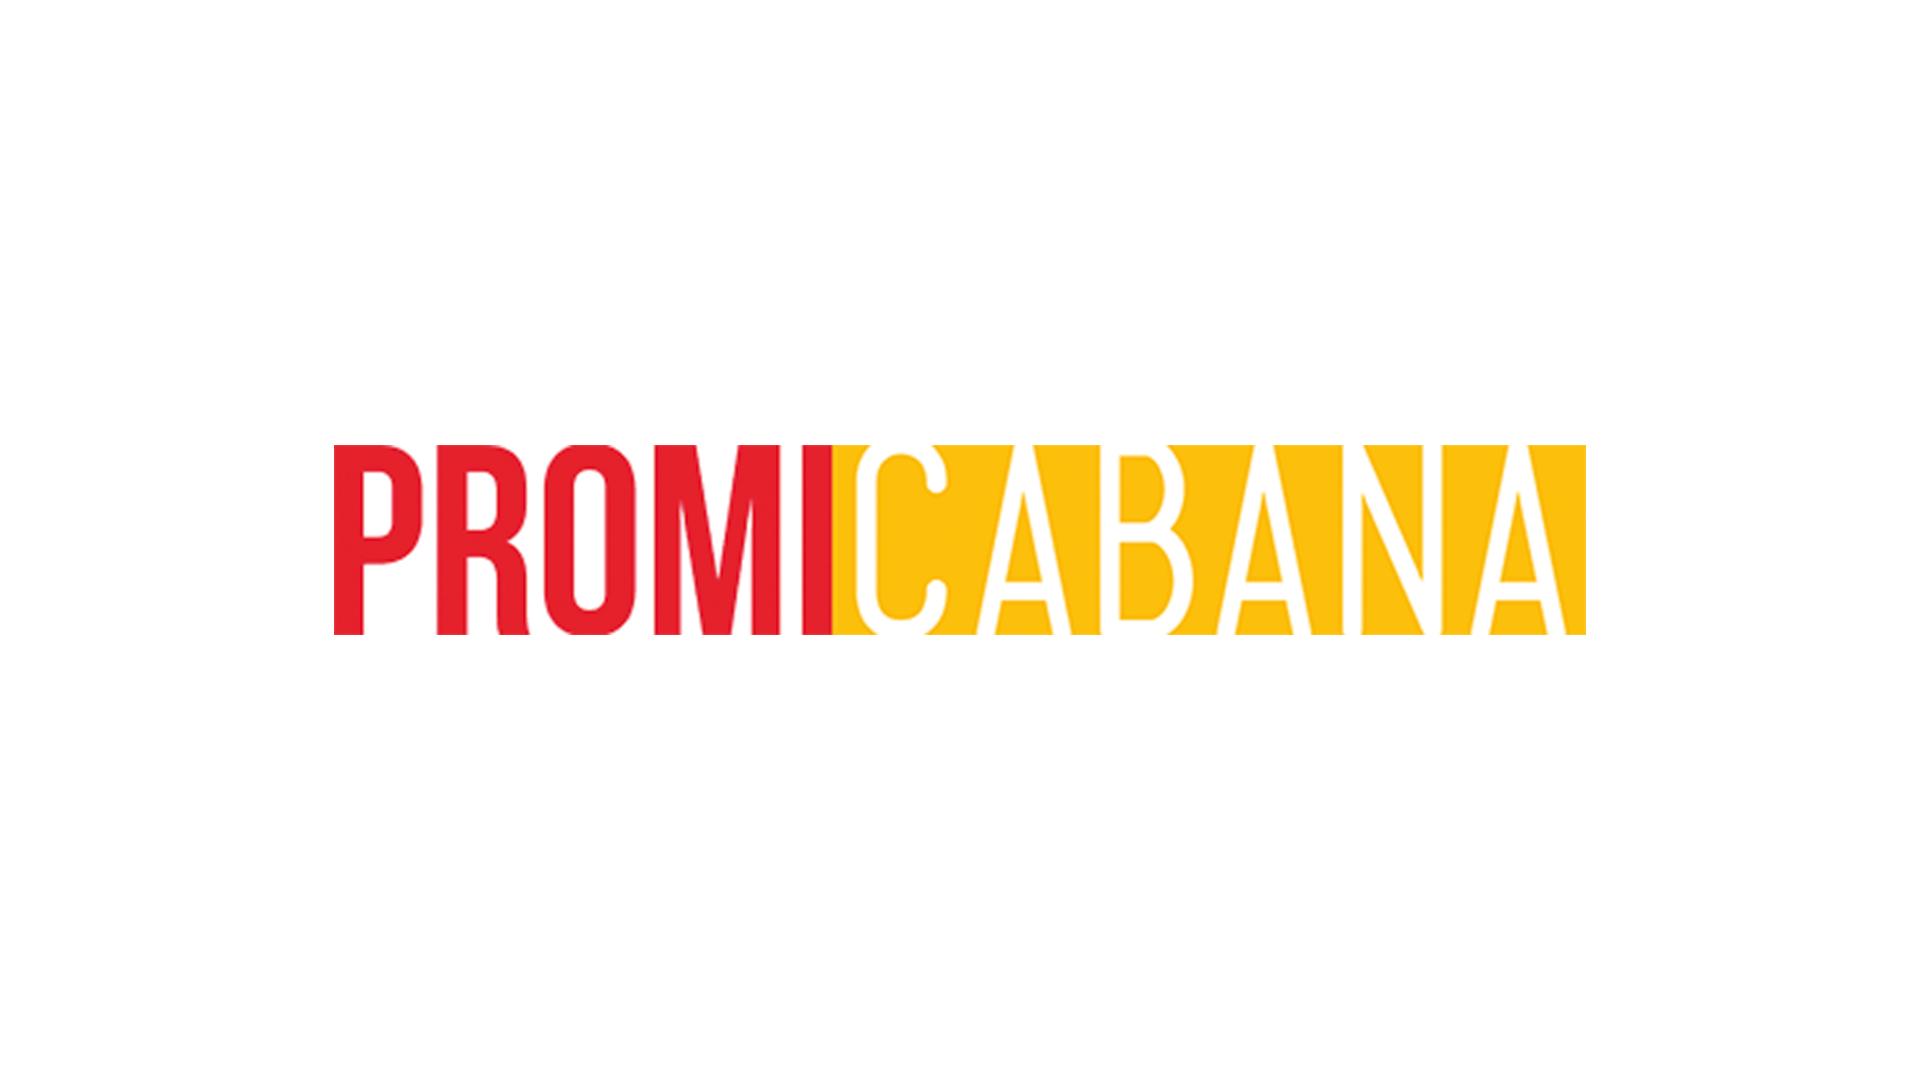 Til-Schweiger-Kokowääh-2-Premiere